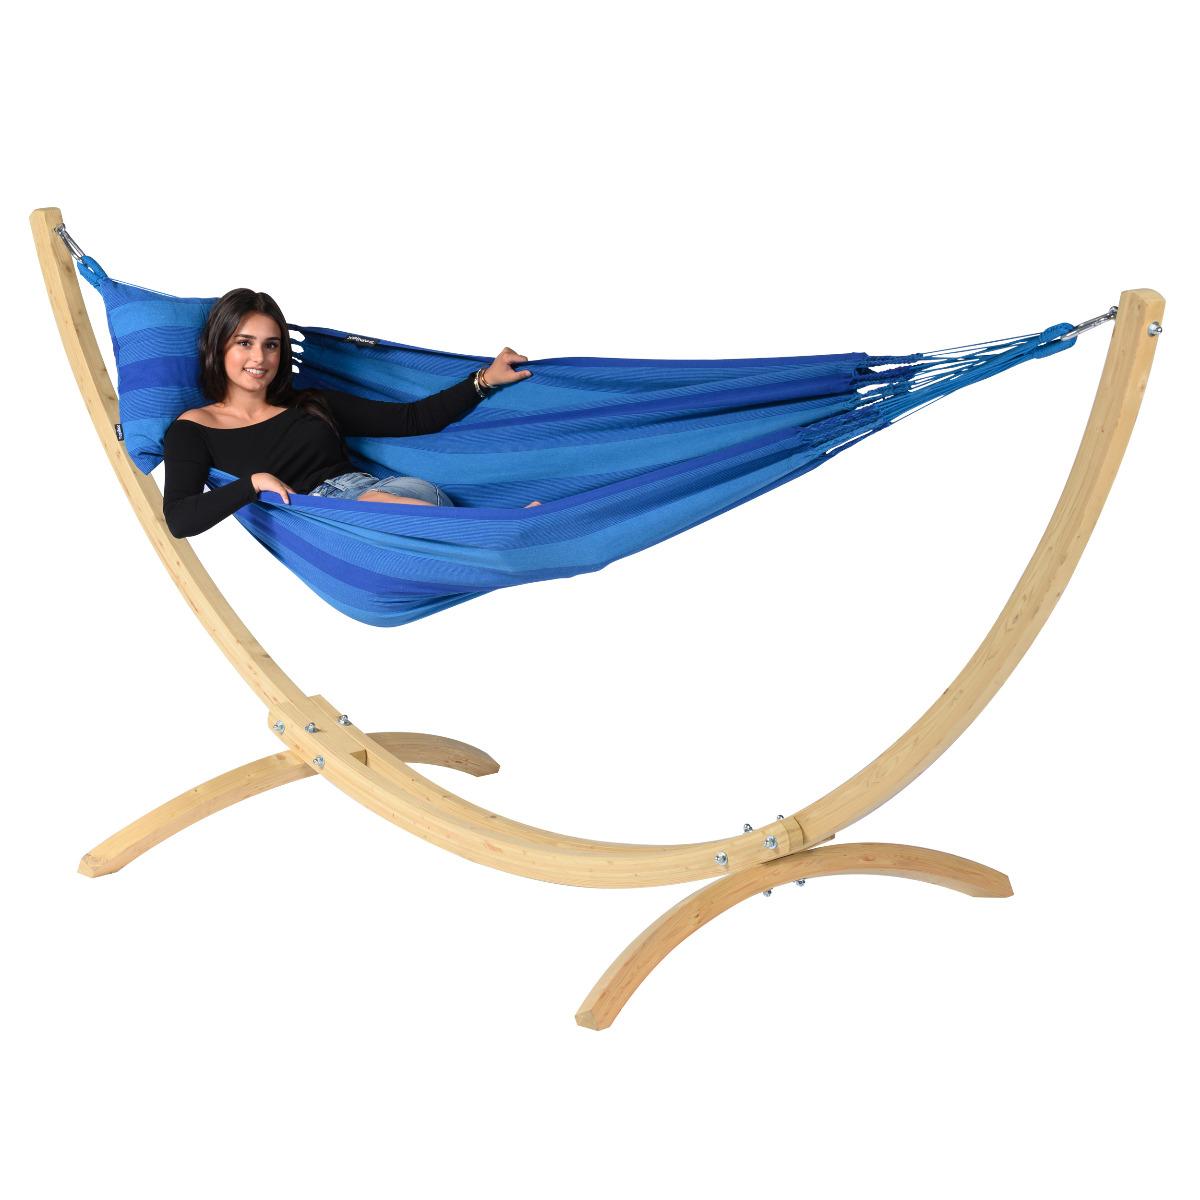 Hangmat met Standaard E�npersoons 'Wood & Dream' Blue - Blauw - Tropilex �